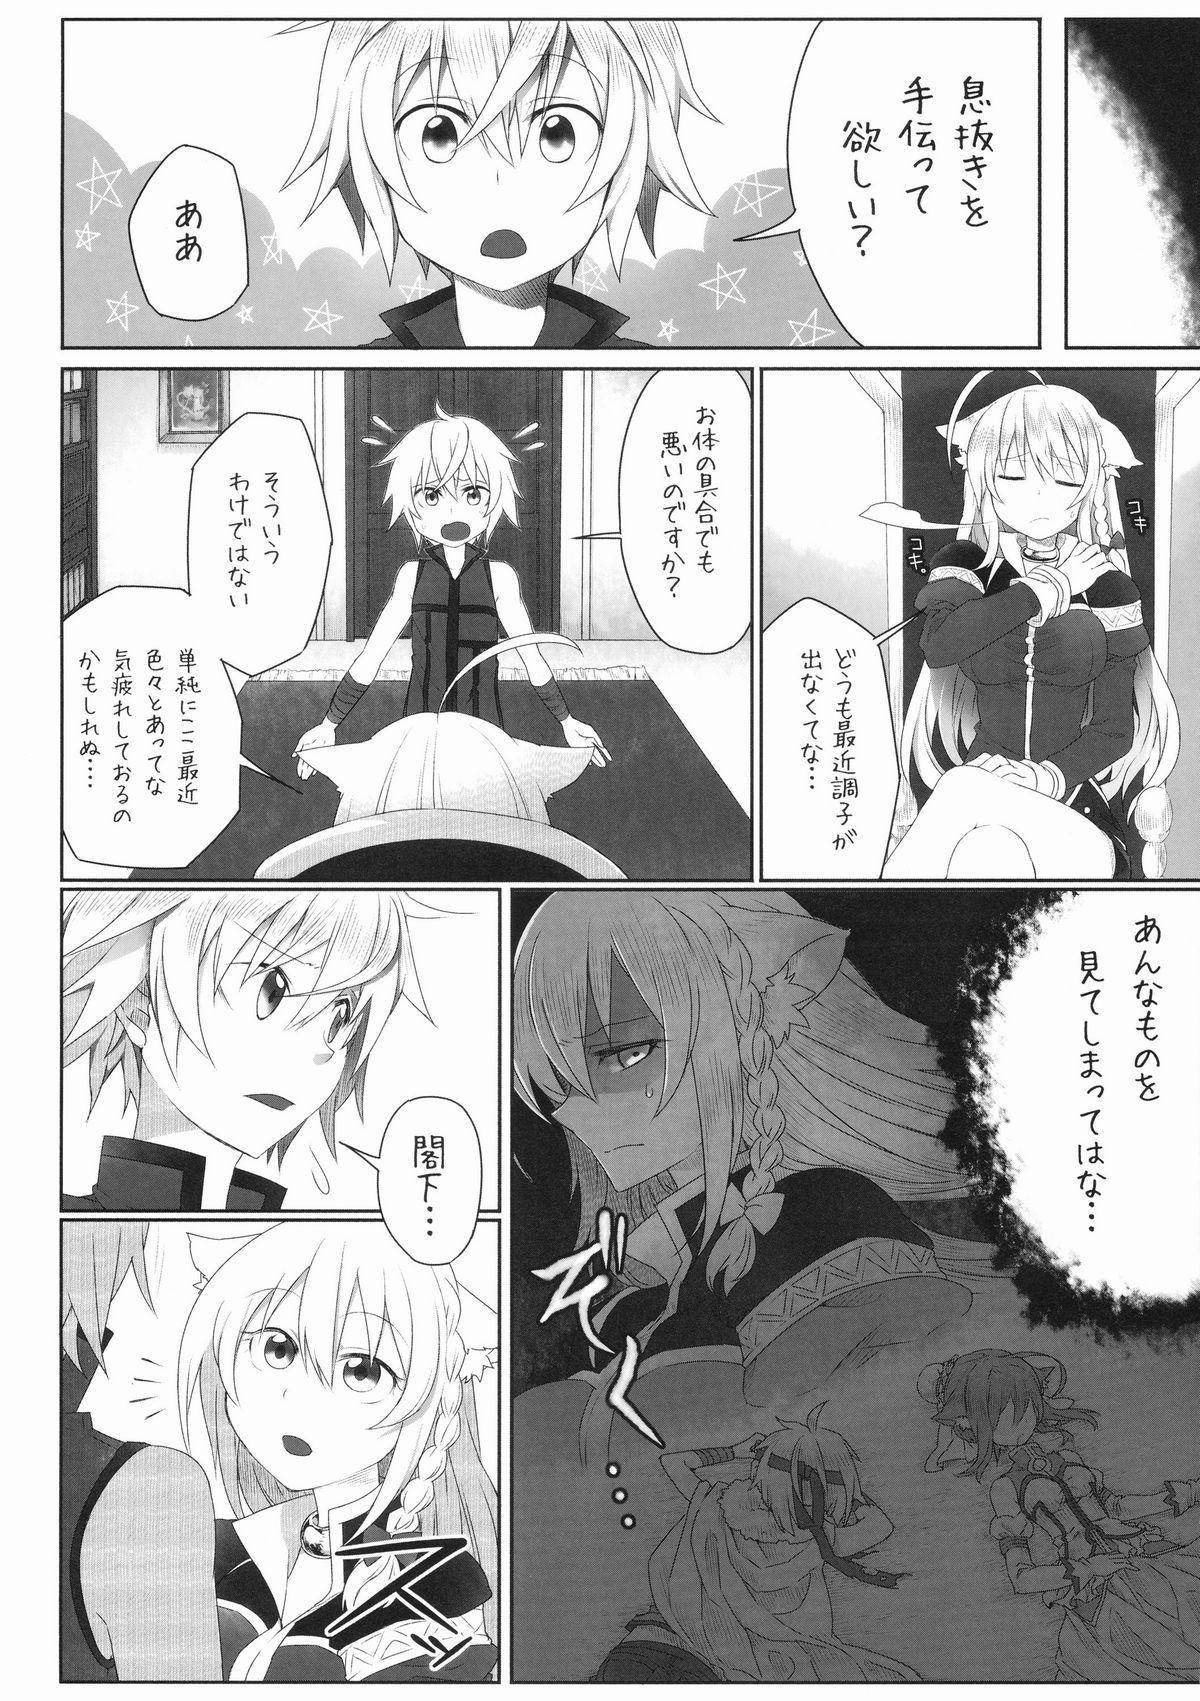 Hatsujou! Neko Hime Choukyou Sen!? 3